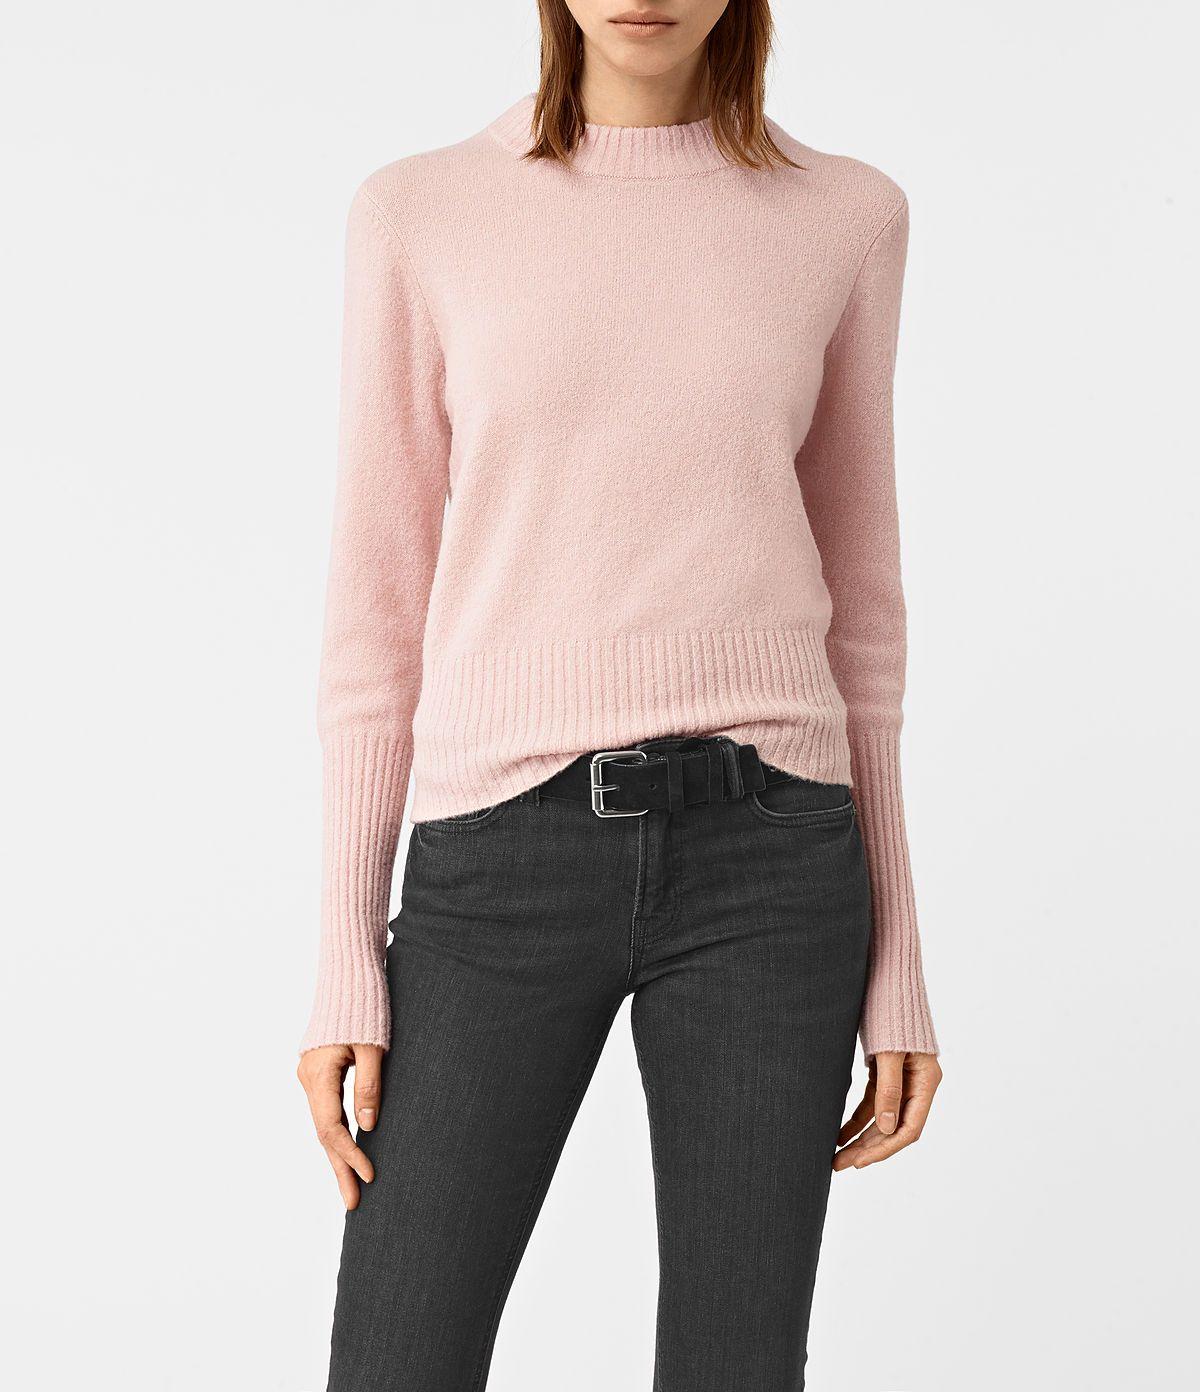 AllSaints New Arrivals: Womens Alpha Crew Neck Sweater | wear ...